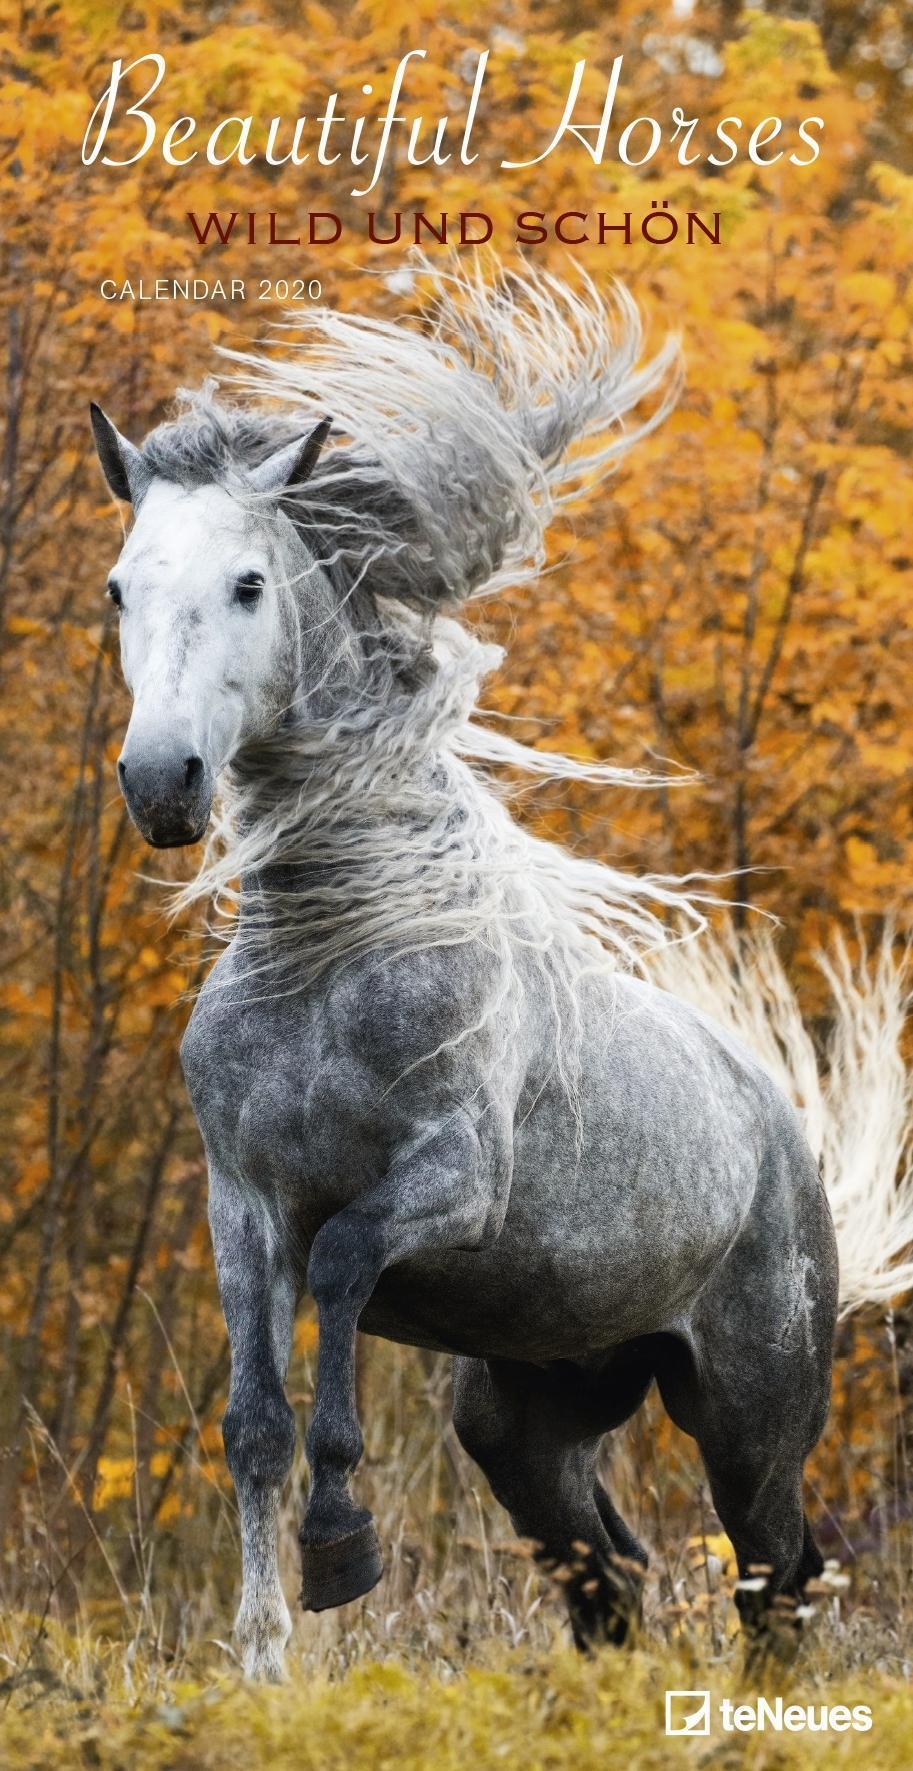 Stationery Horses 2020 Calendar and Diary Set Hardback Brand New